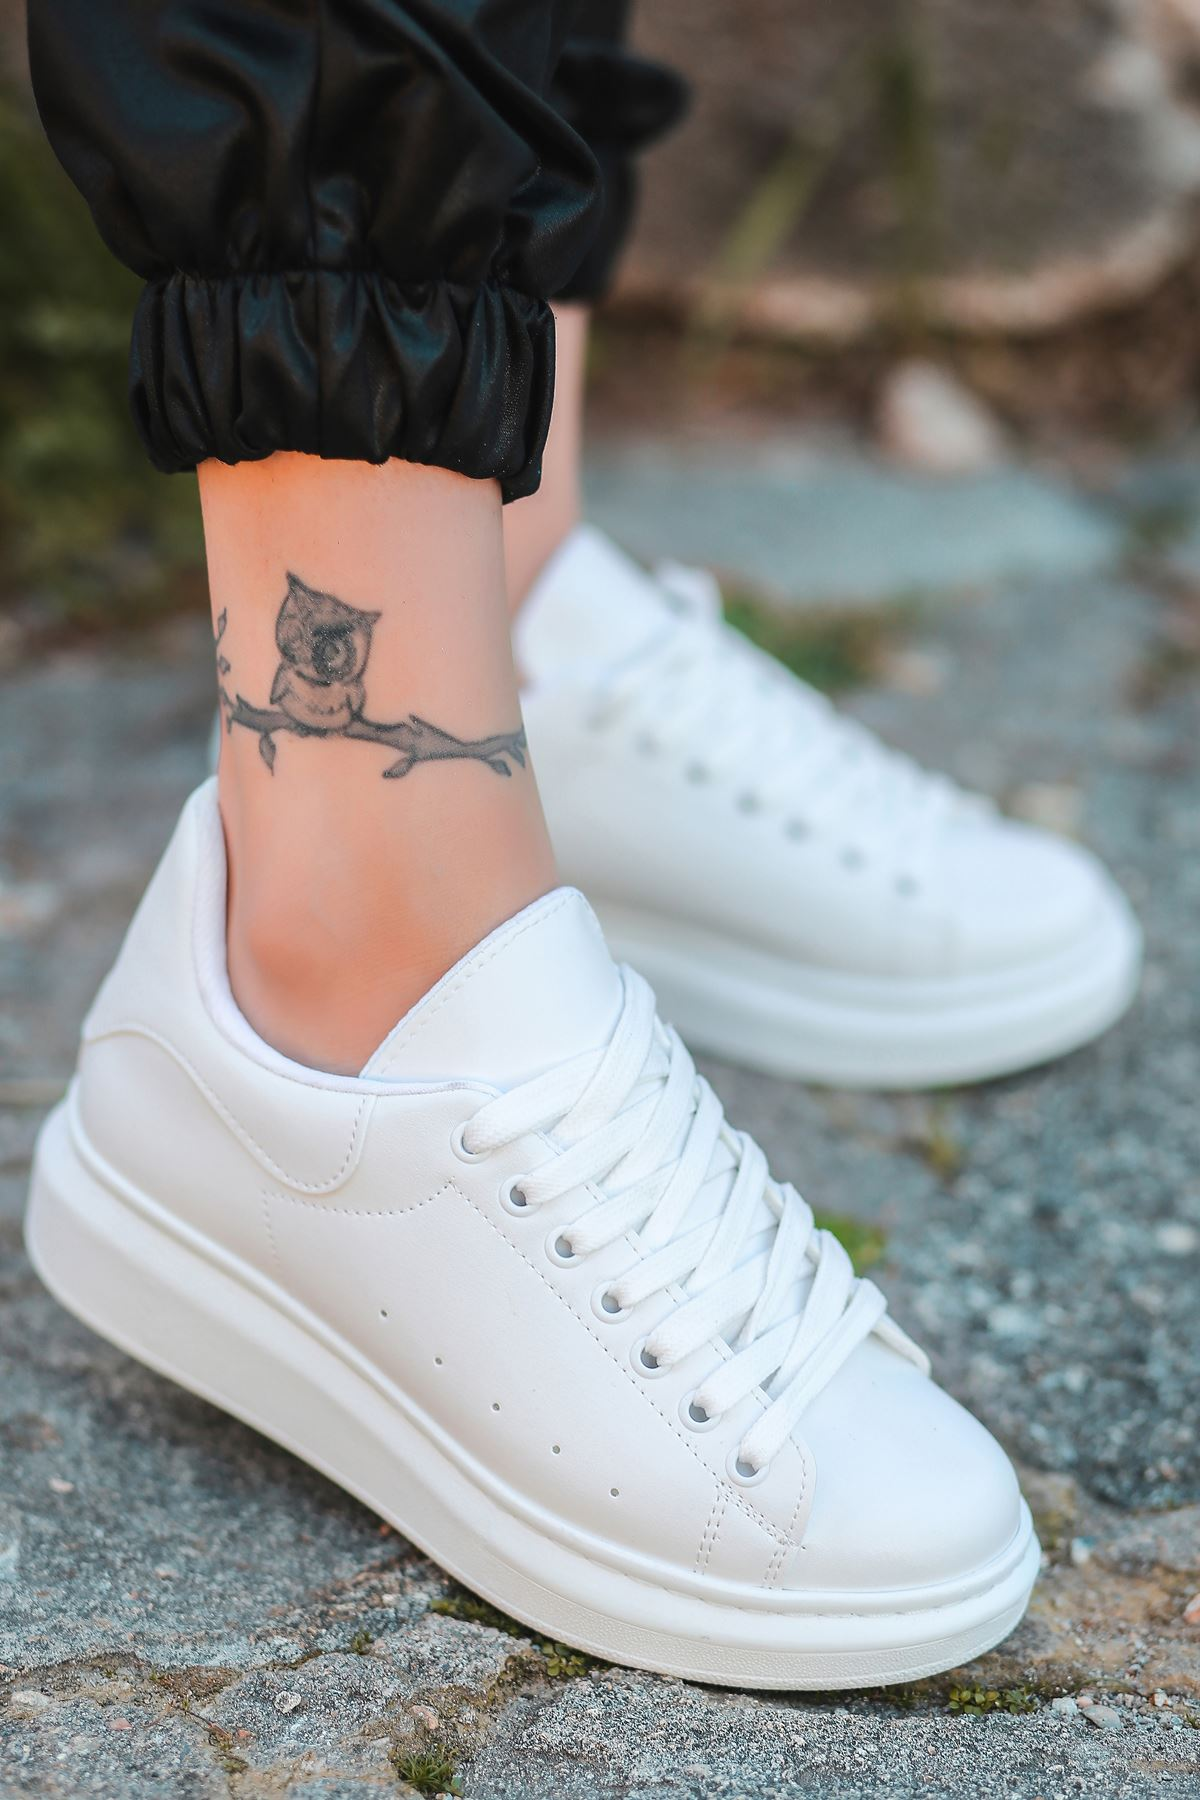 Lucy Mat Deri Bağcık Detay Sneakers Beyaz